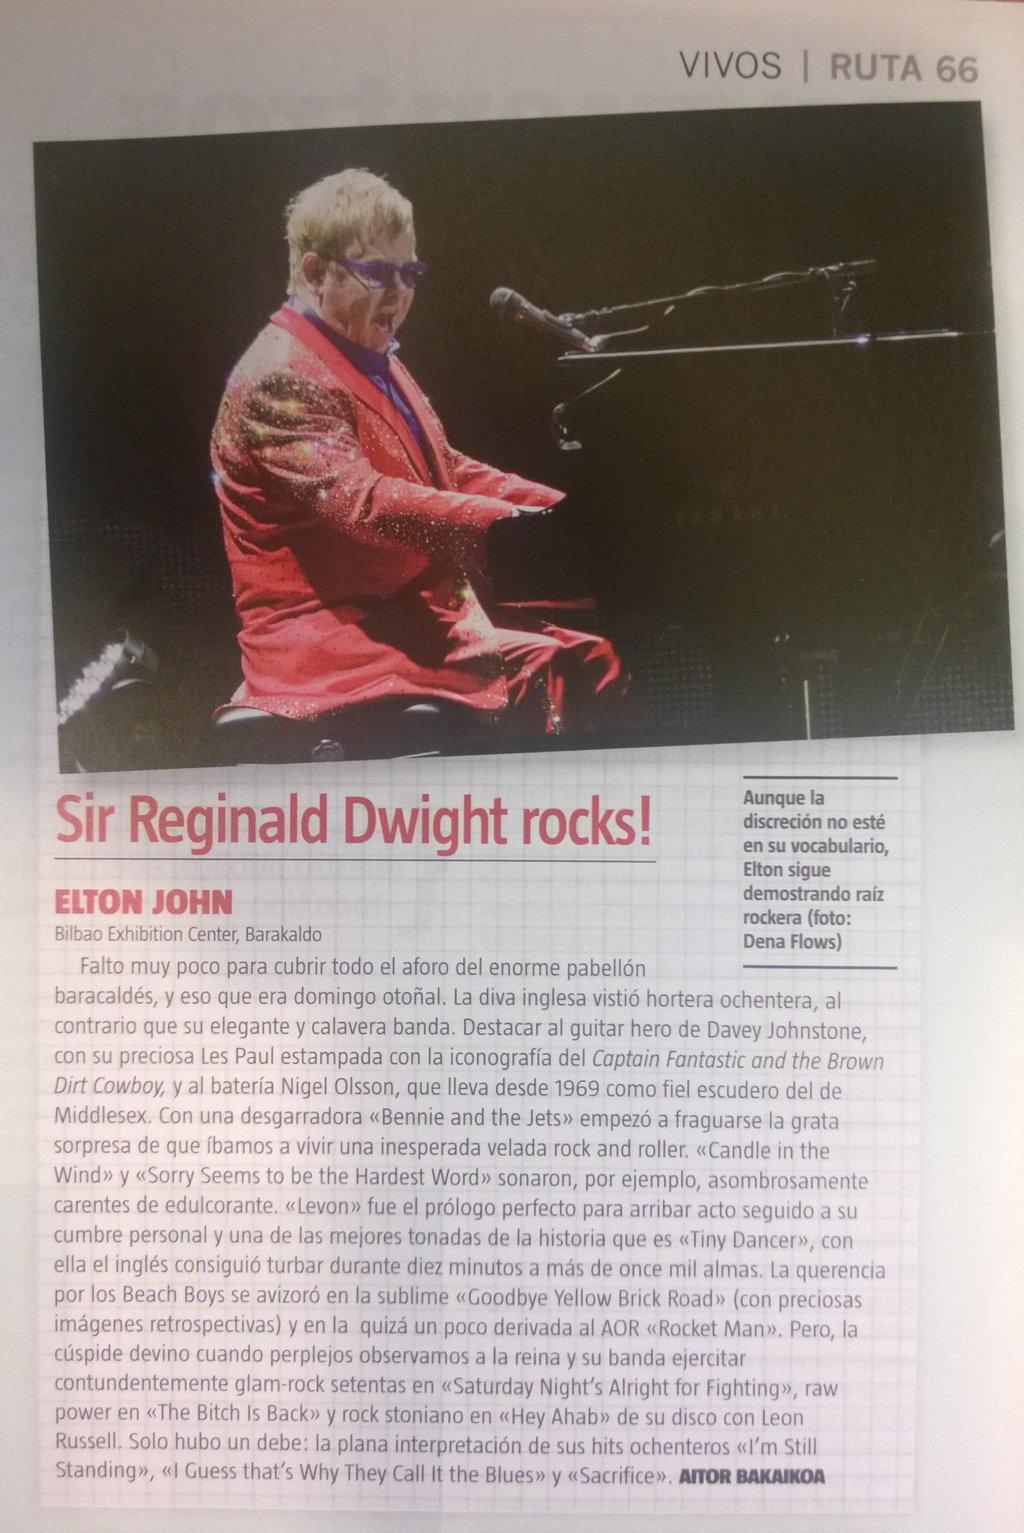 Captura de la crónica y foto de Elton John en Ruta 66 (diciembre de 2014)